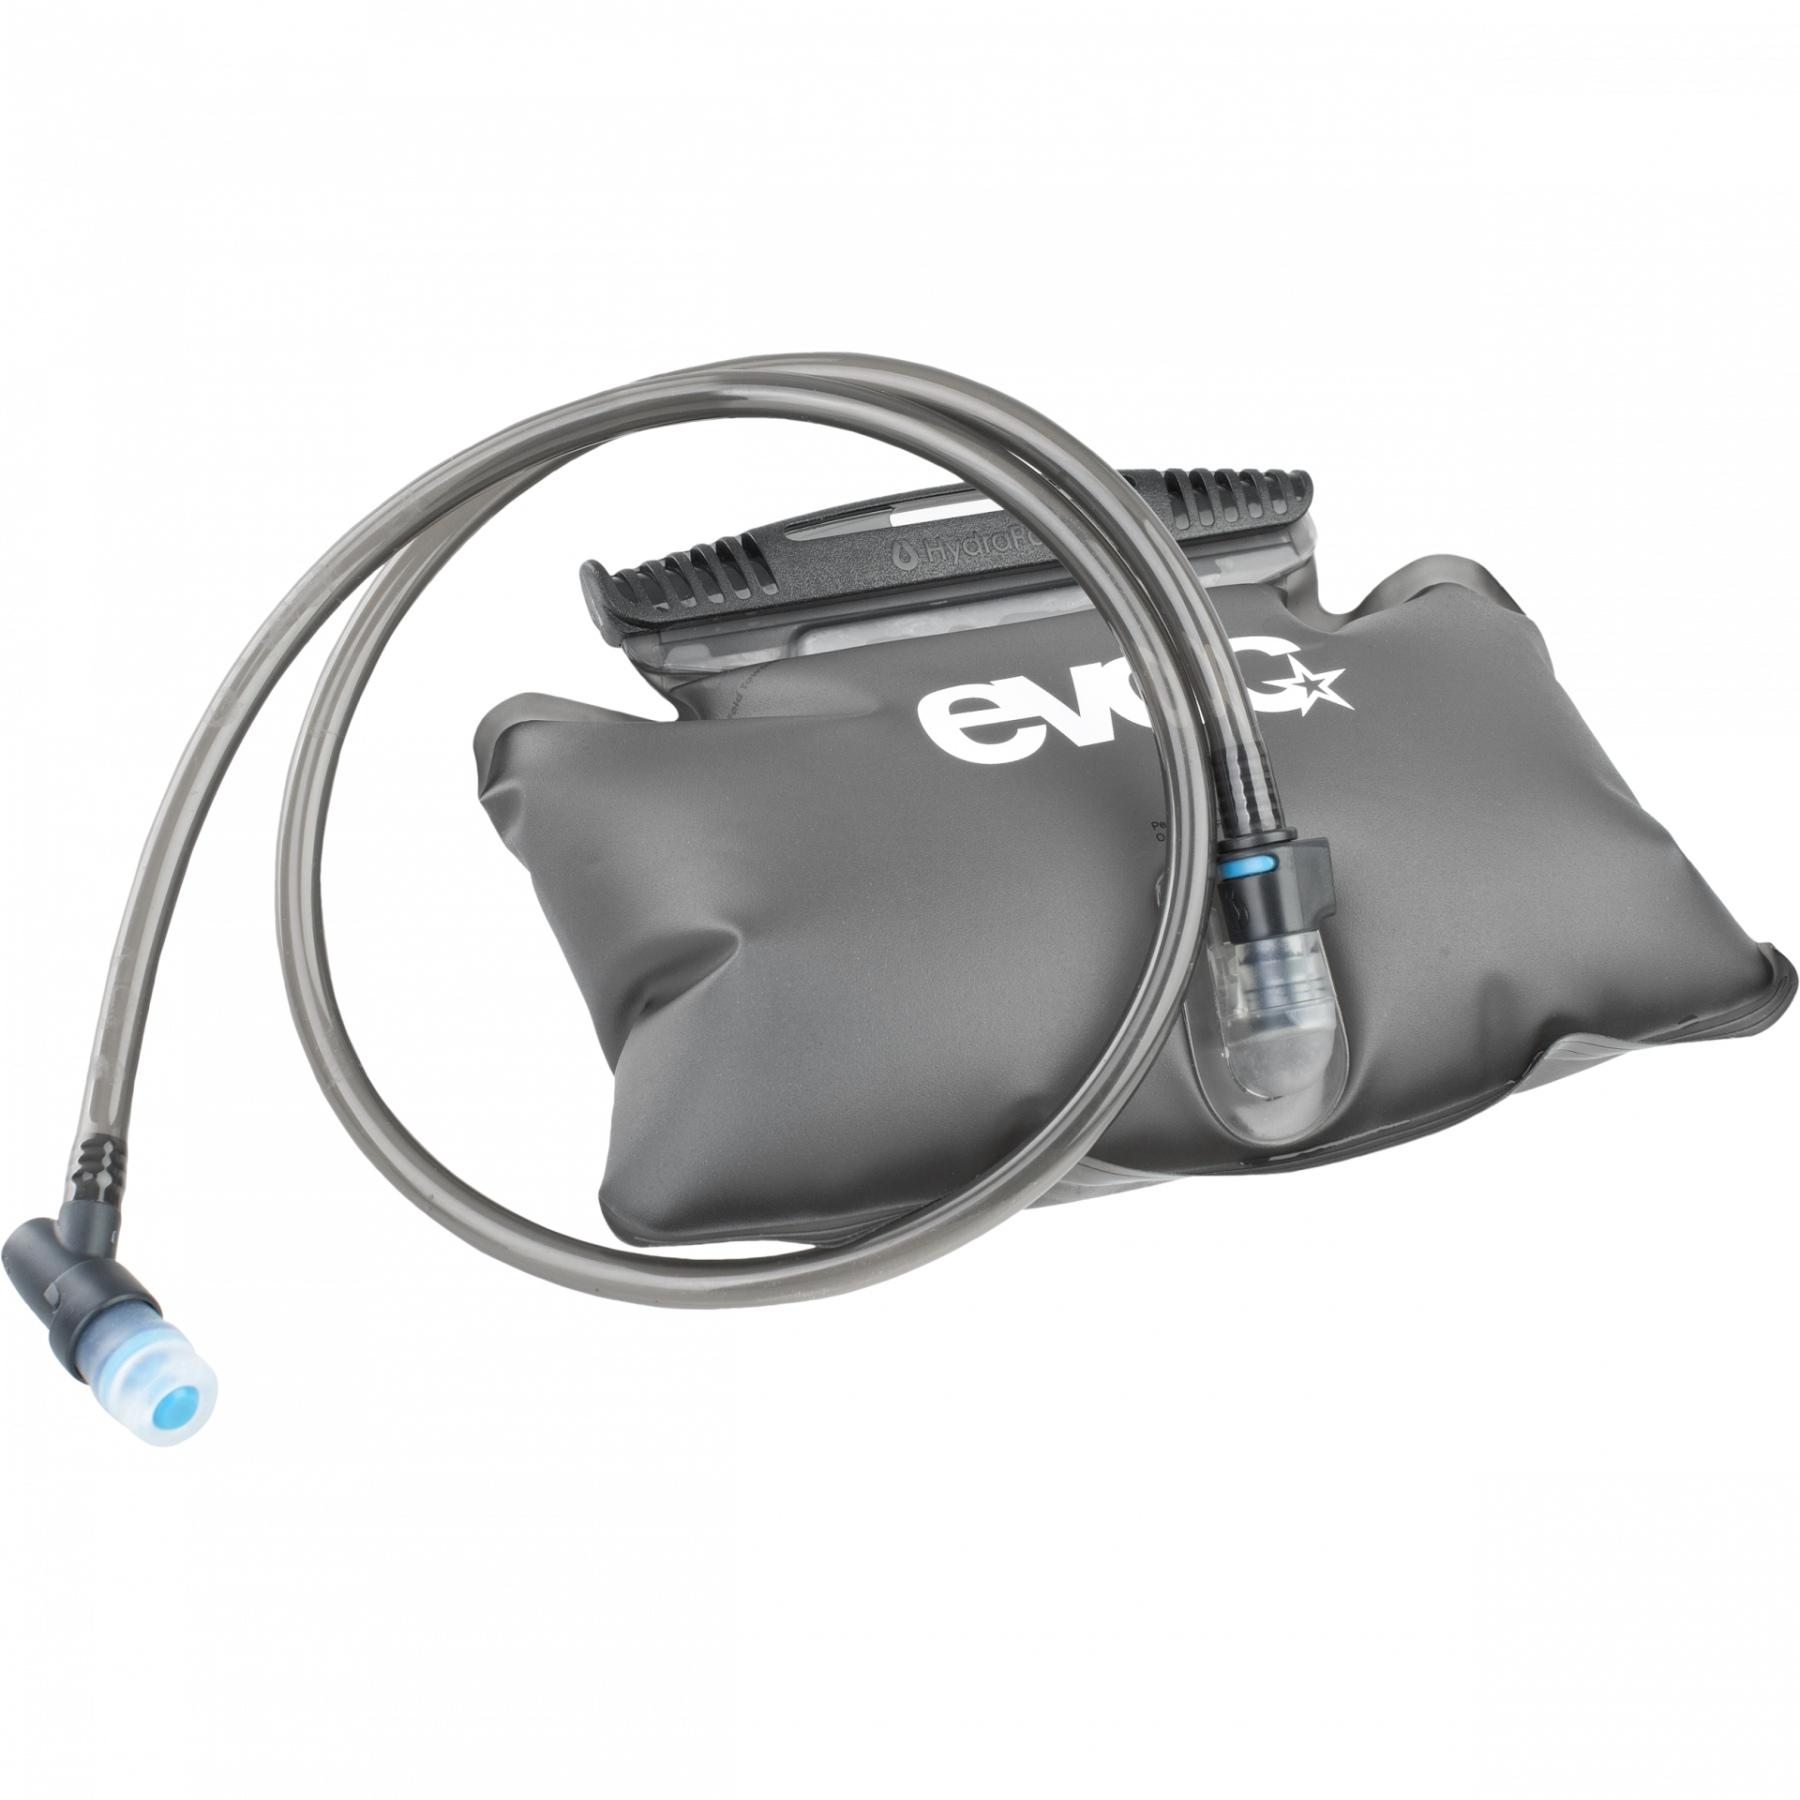 Picture of EVOC Hip Pack Hydration Bladder 1.5 L - Carbon Grey